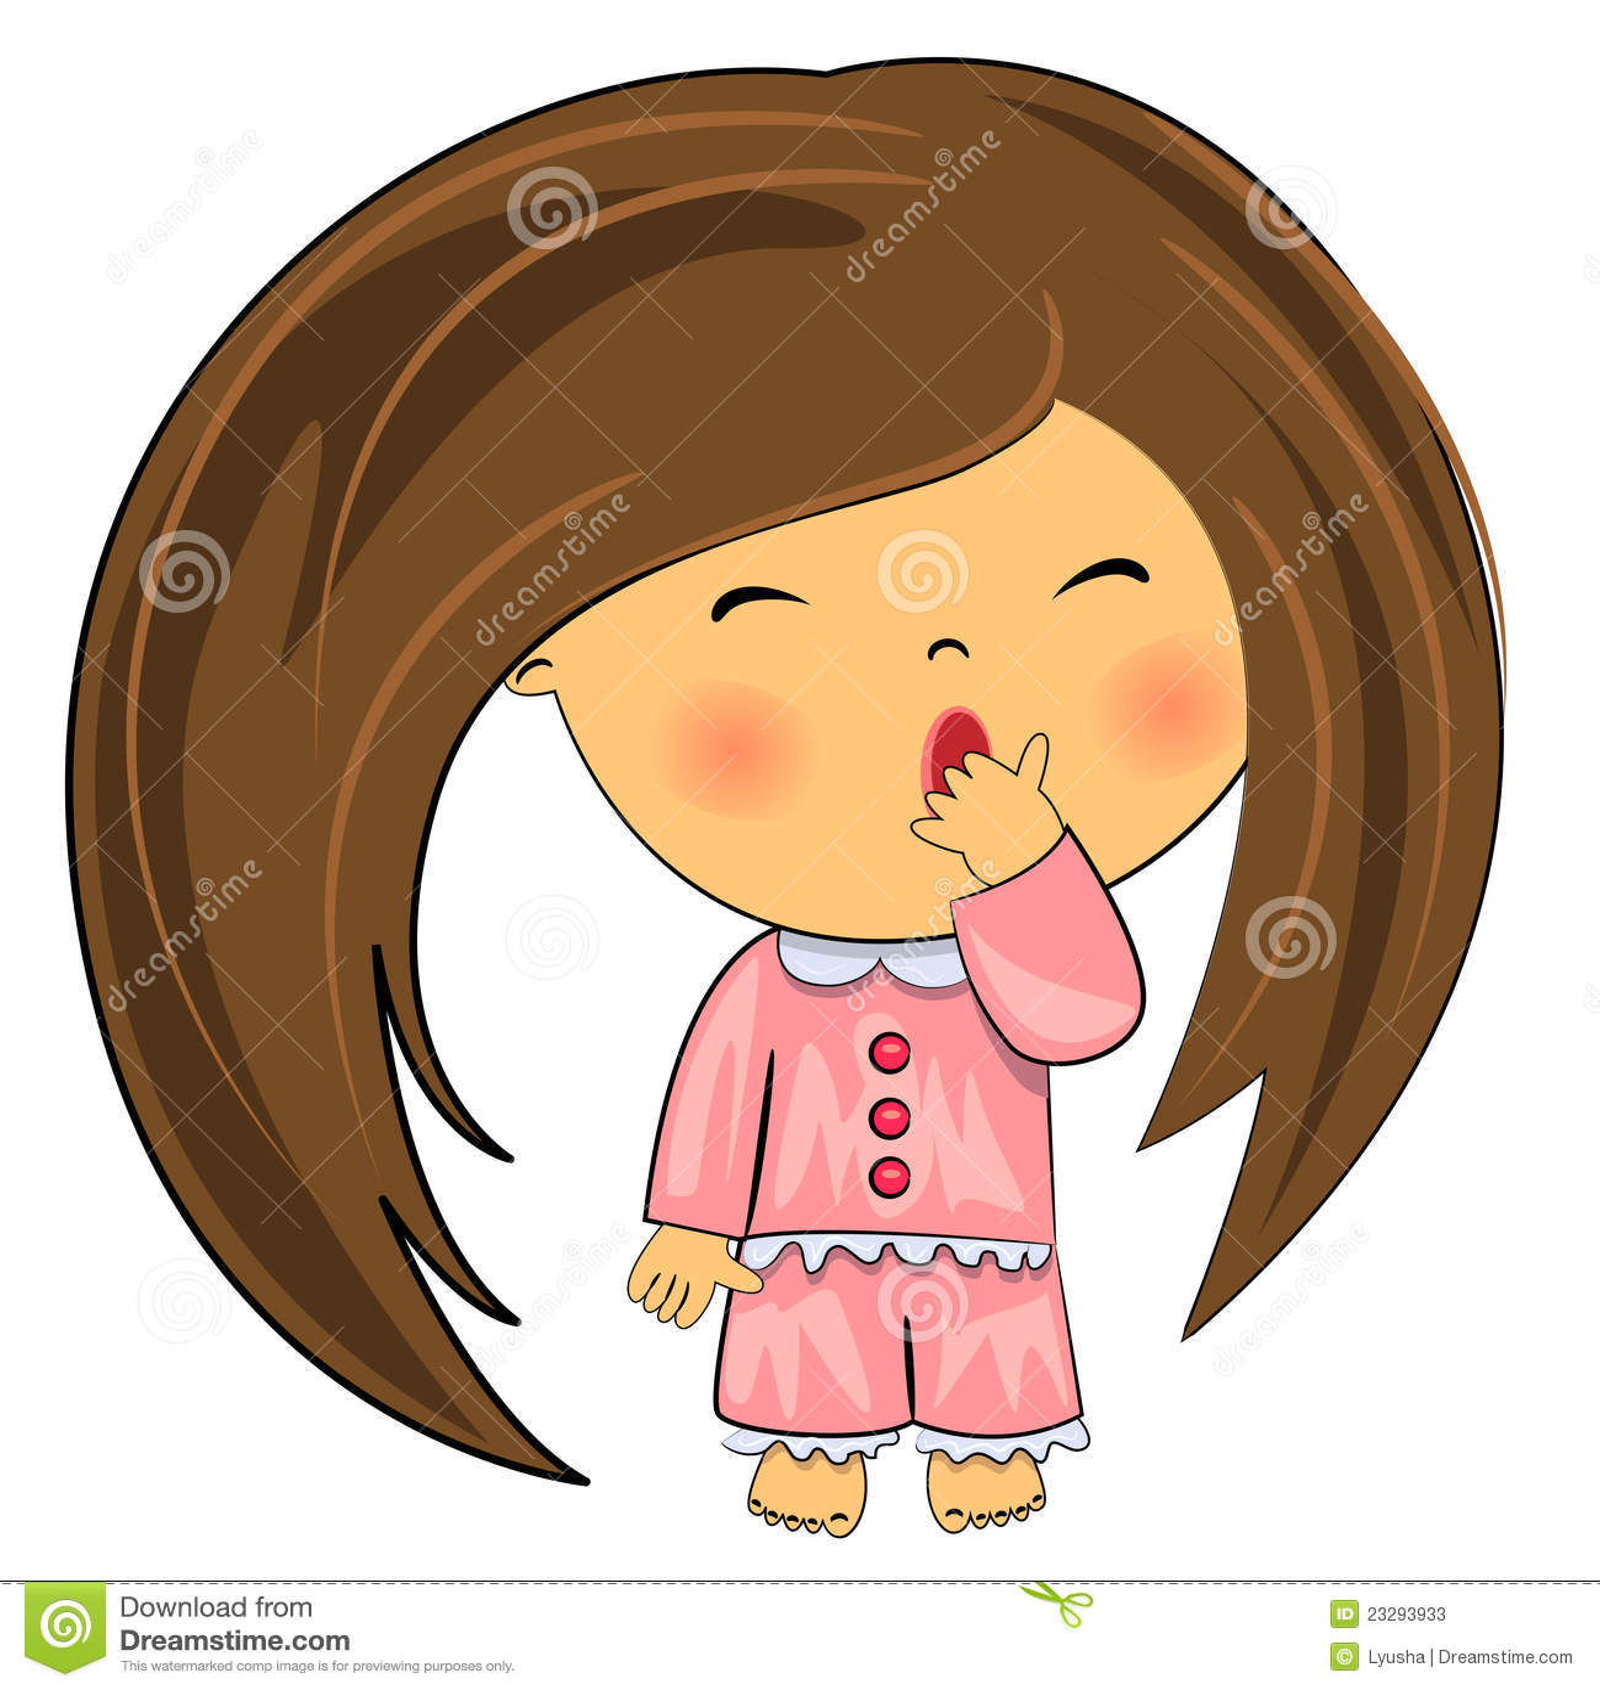 Yawning Kid. Cute Little Girl Stock Photos - Image: 23293933 Yawning Girl Cartoon